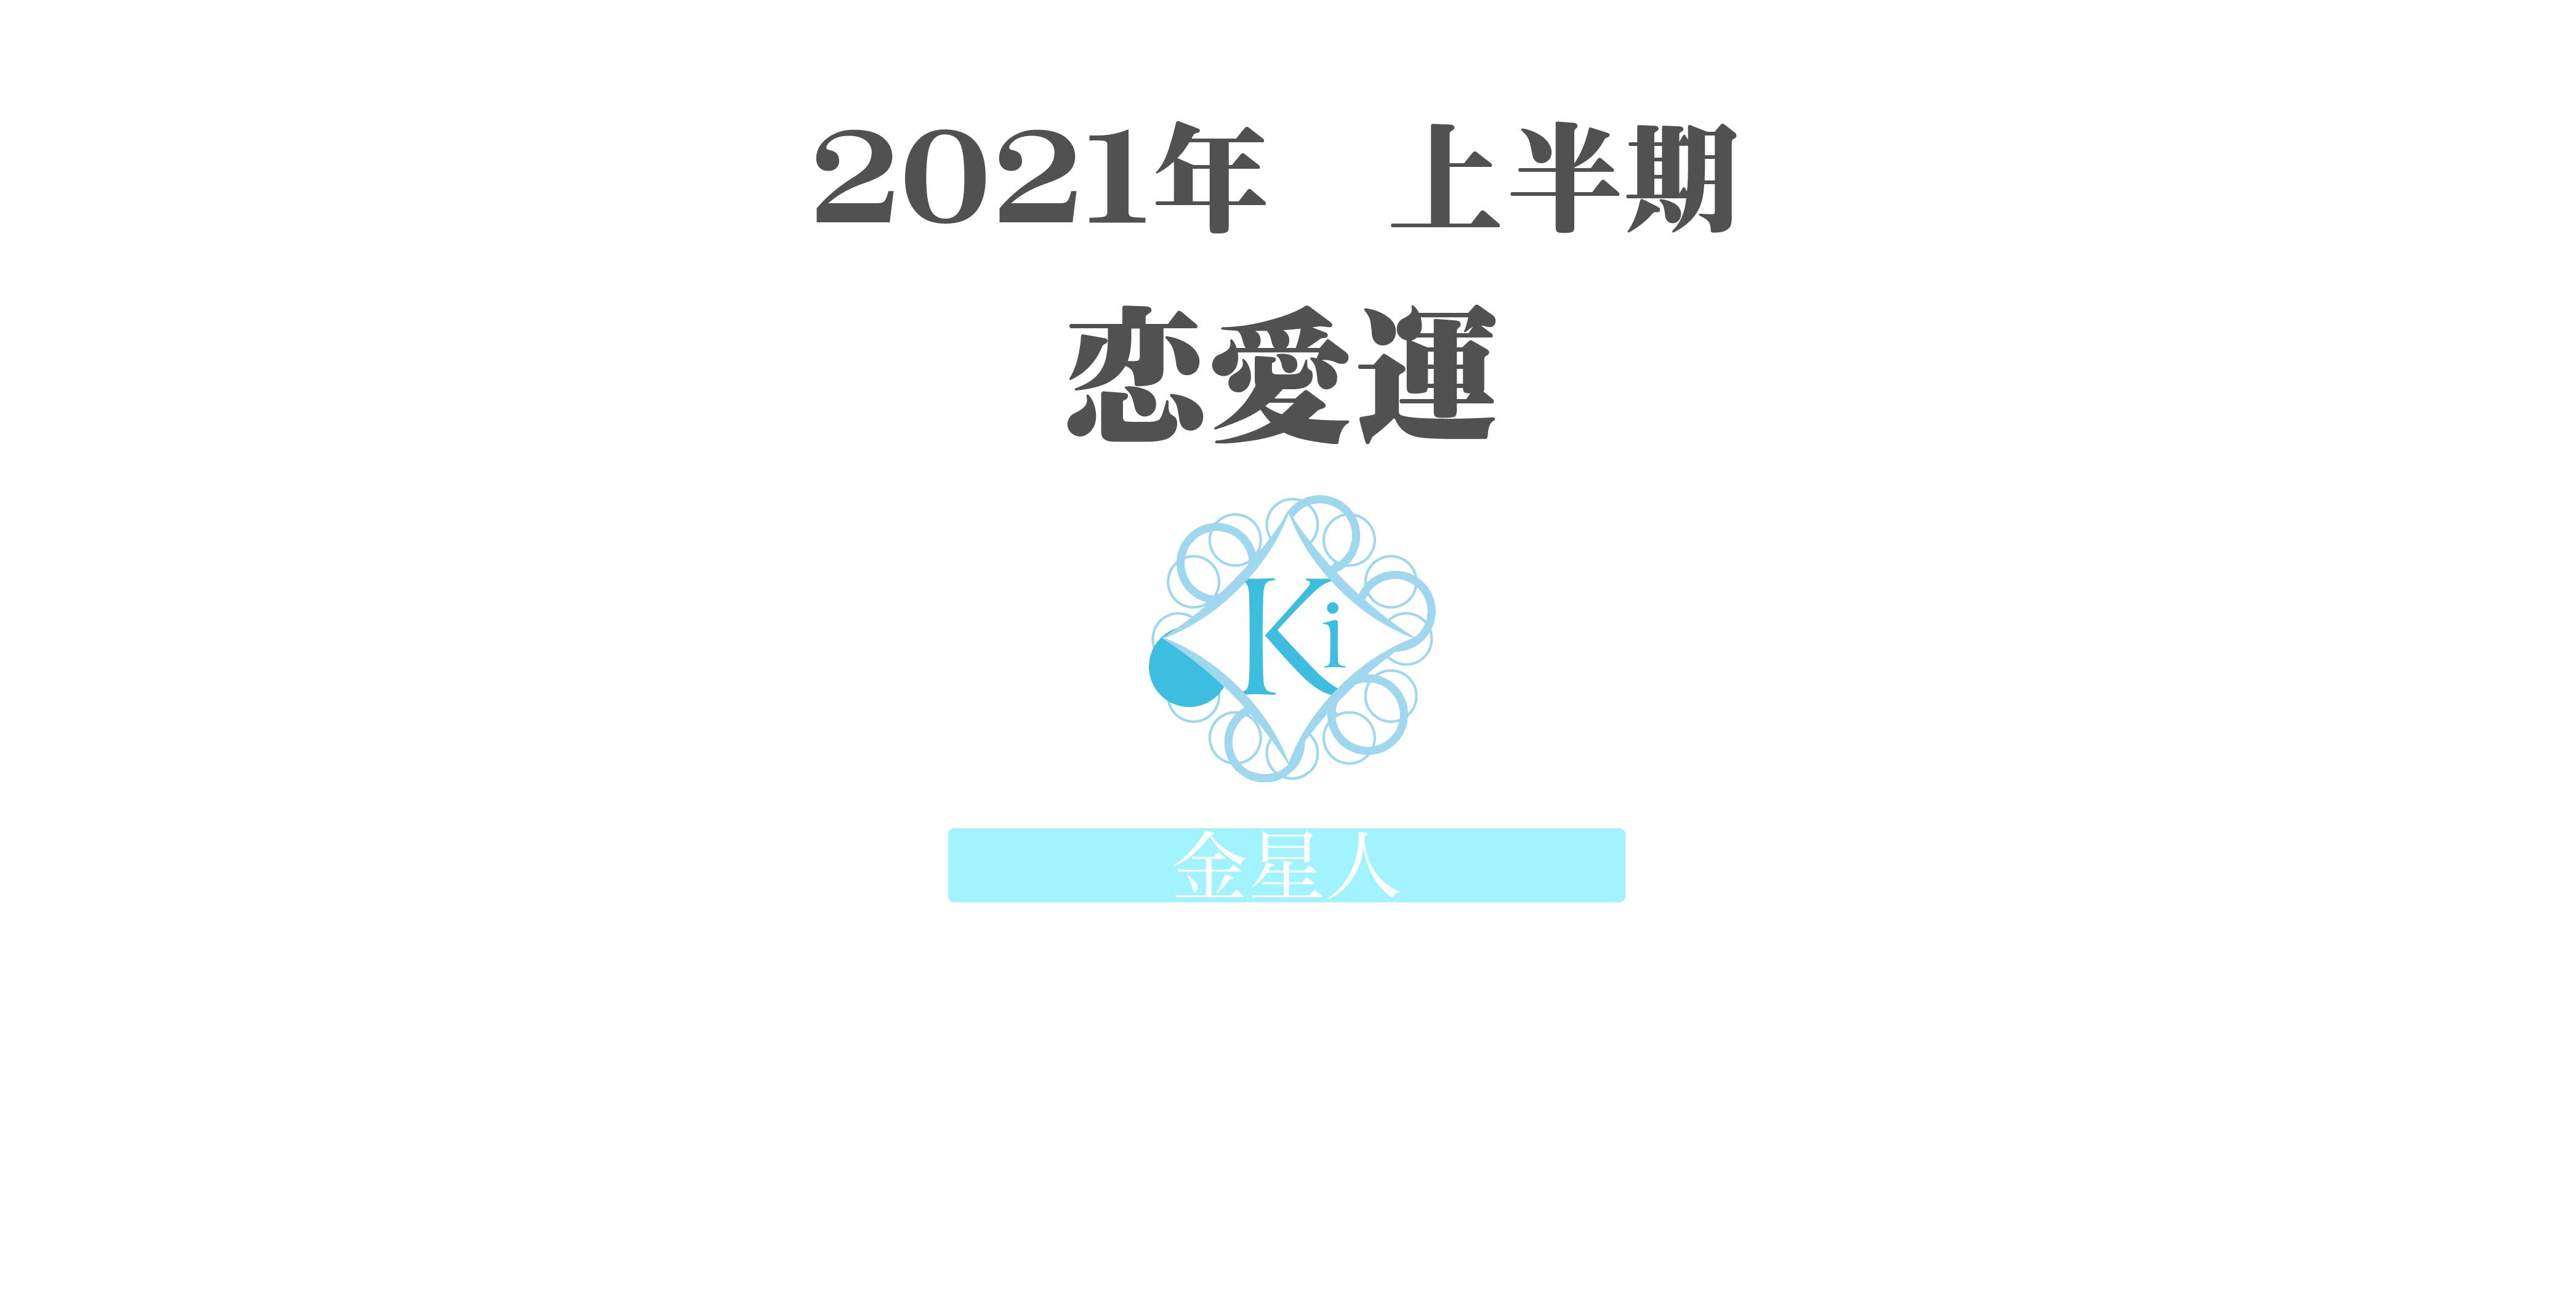 【金星人】の2021年上半期恋愛運